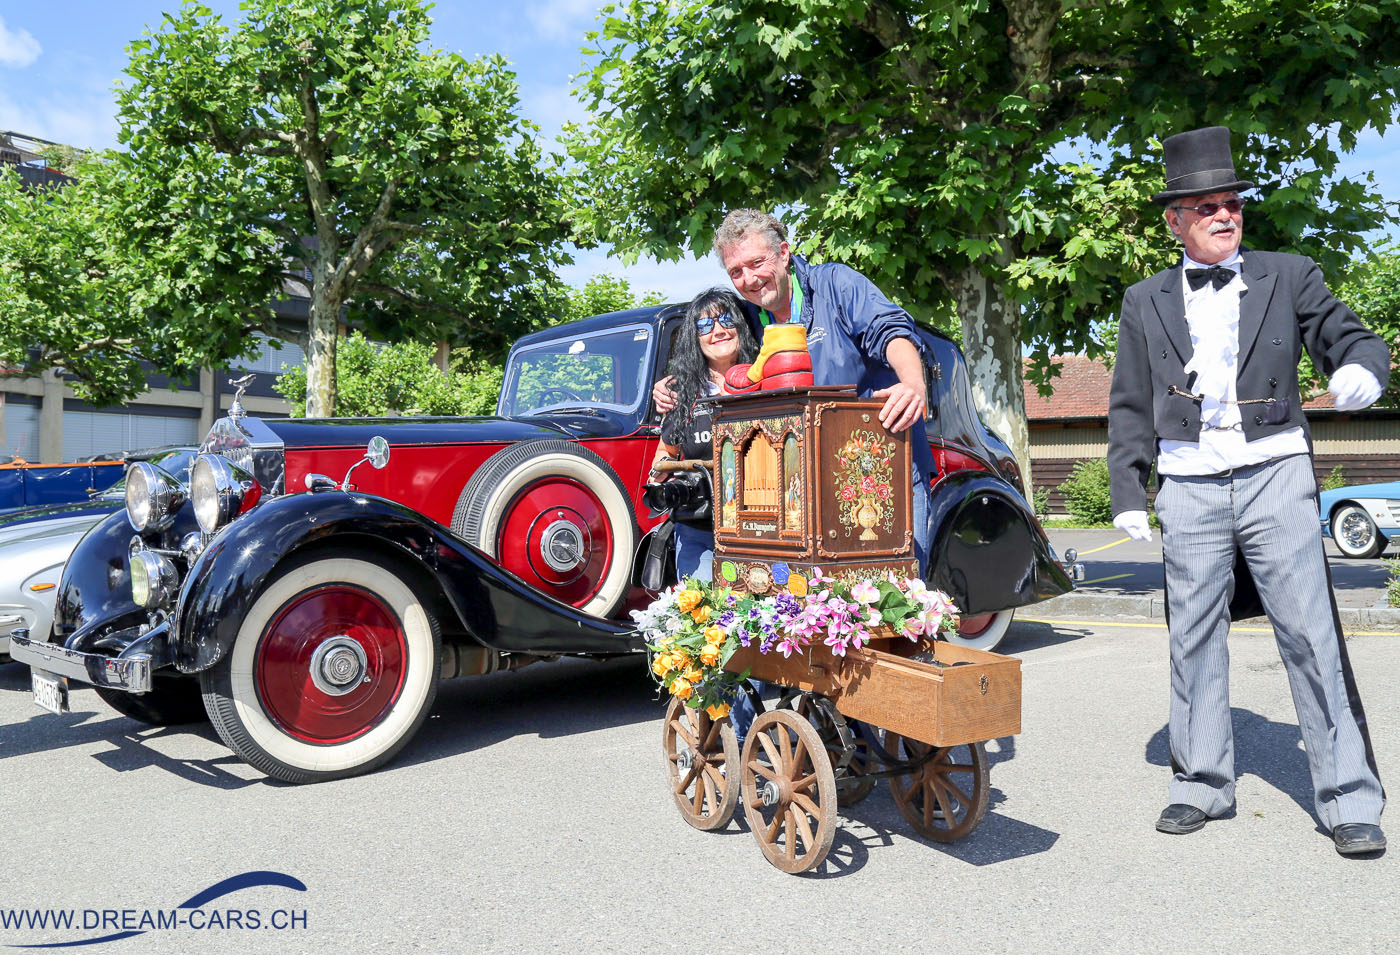 OSMT - Oldtimer Sunday Morning Treffen Zug, Juli 2016